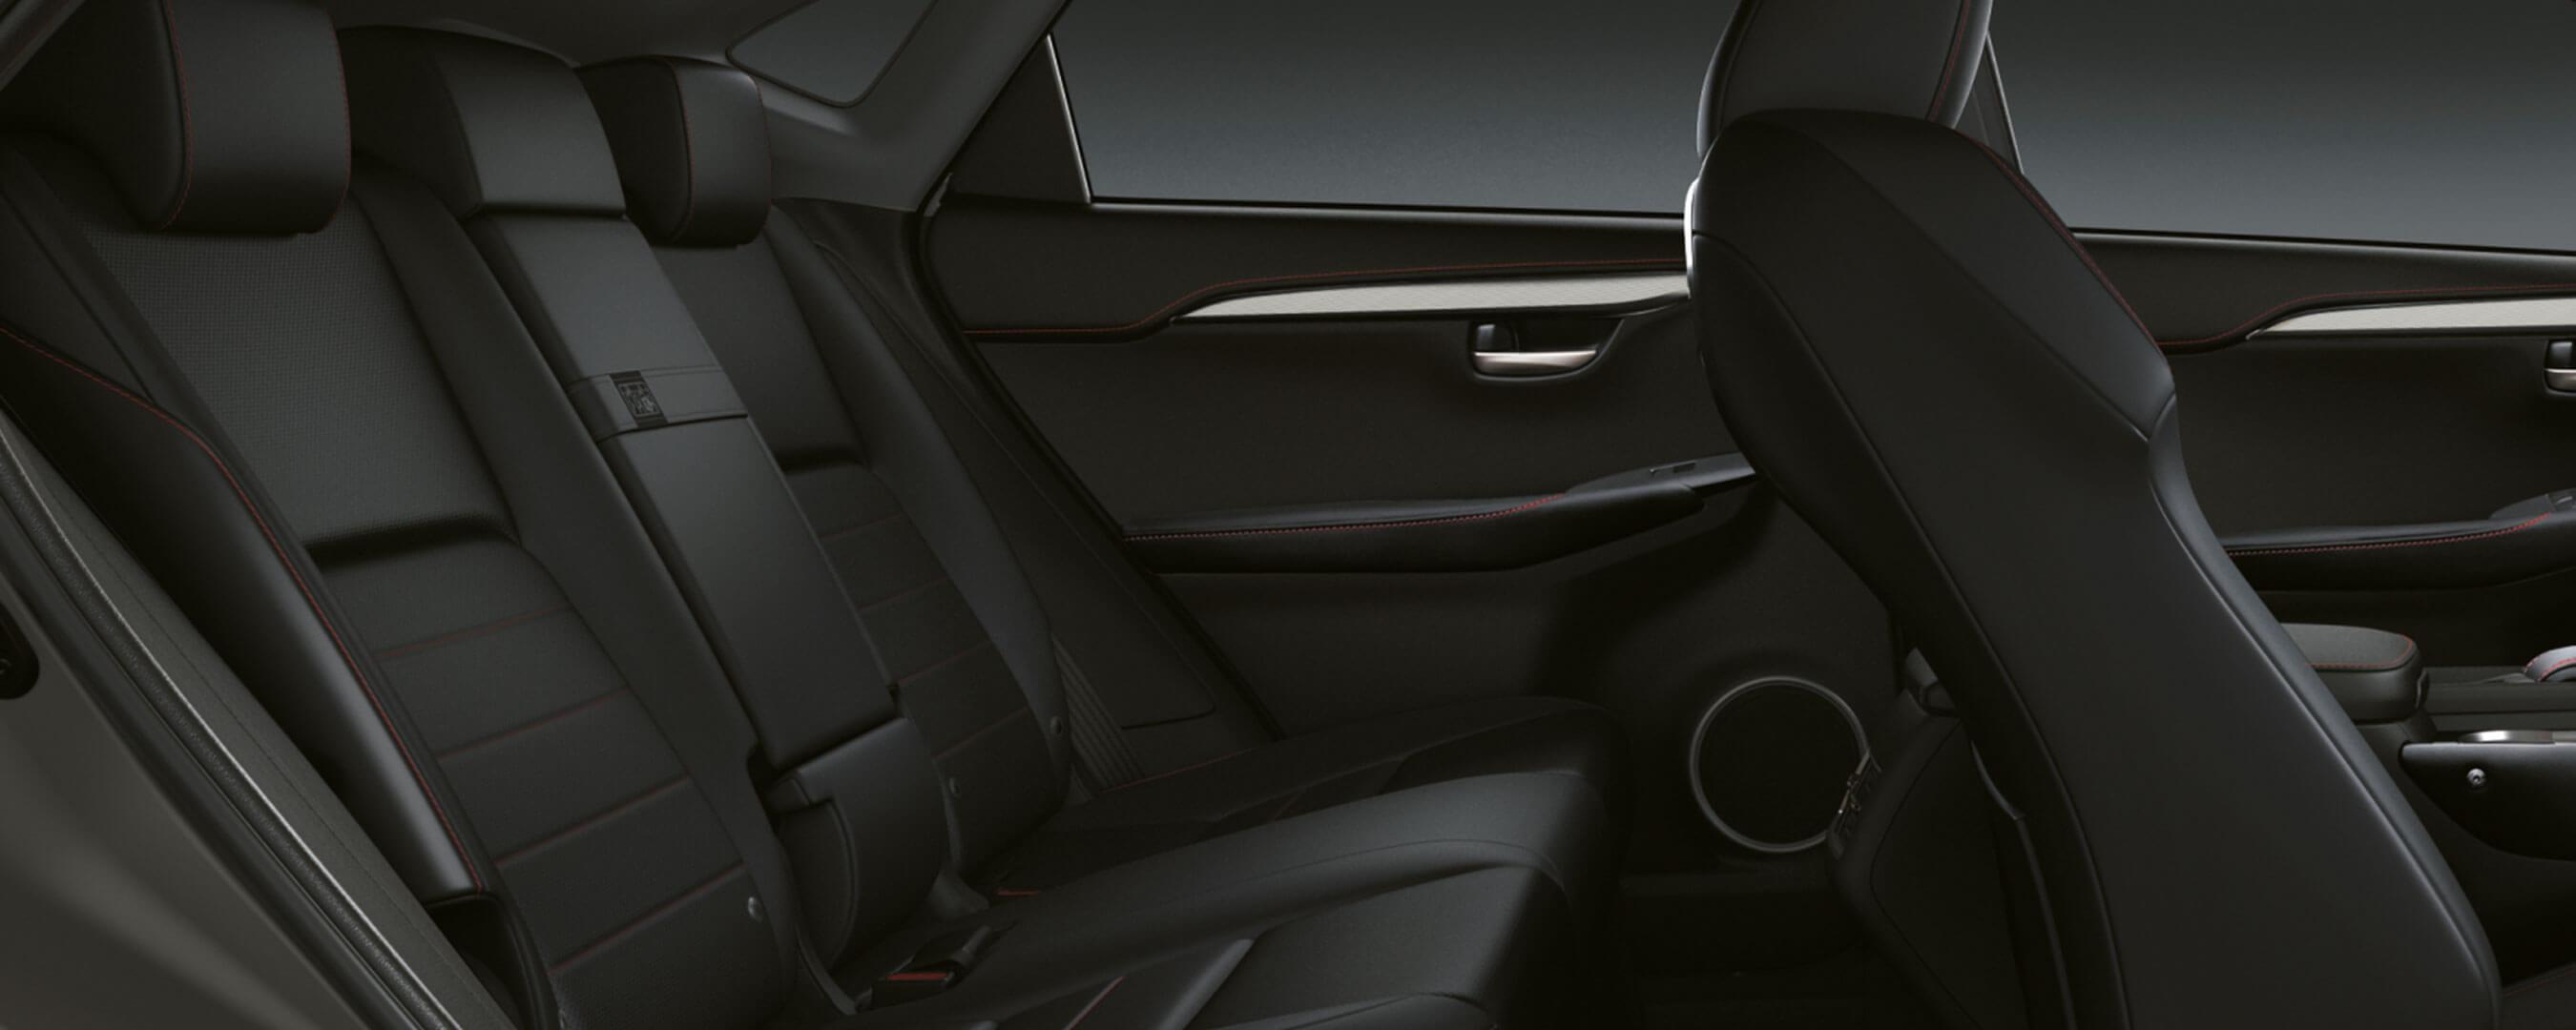 2017 lexus nx 300h experience hero interior back